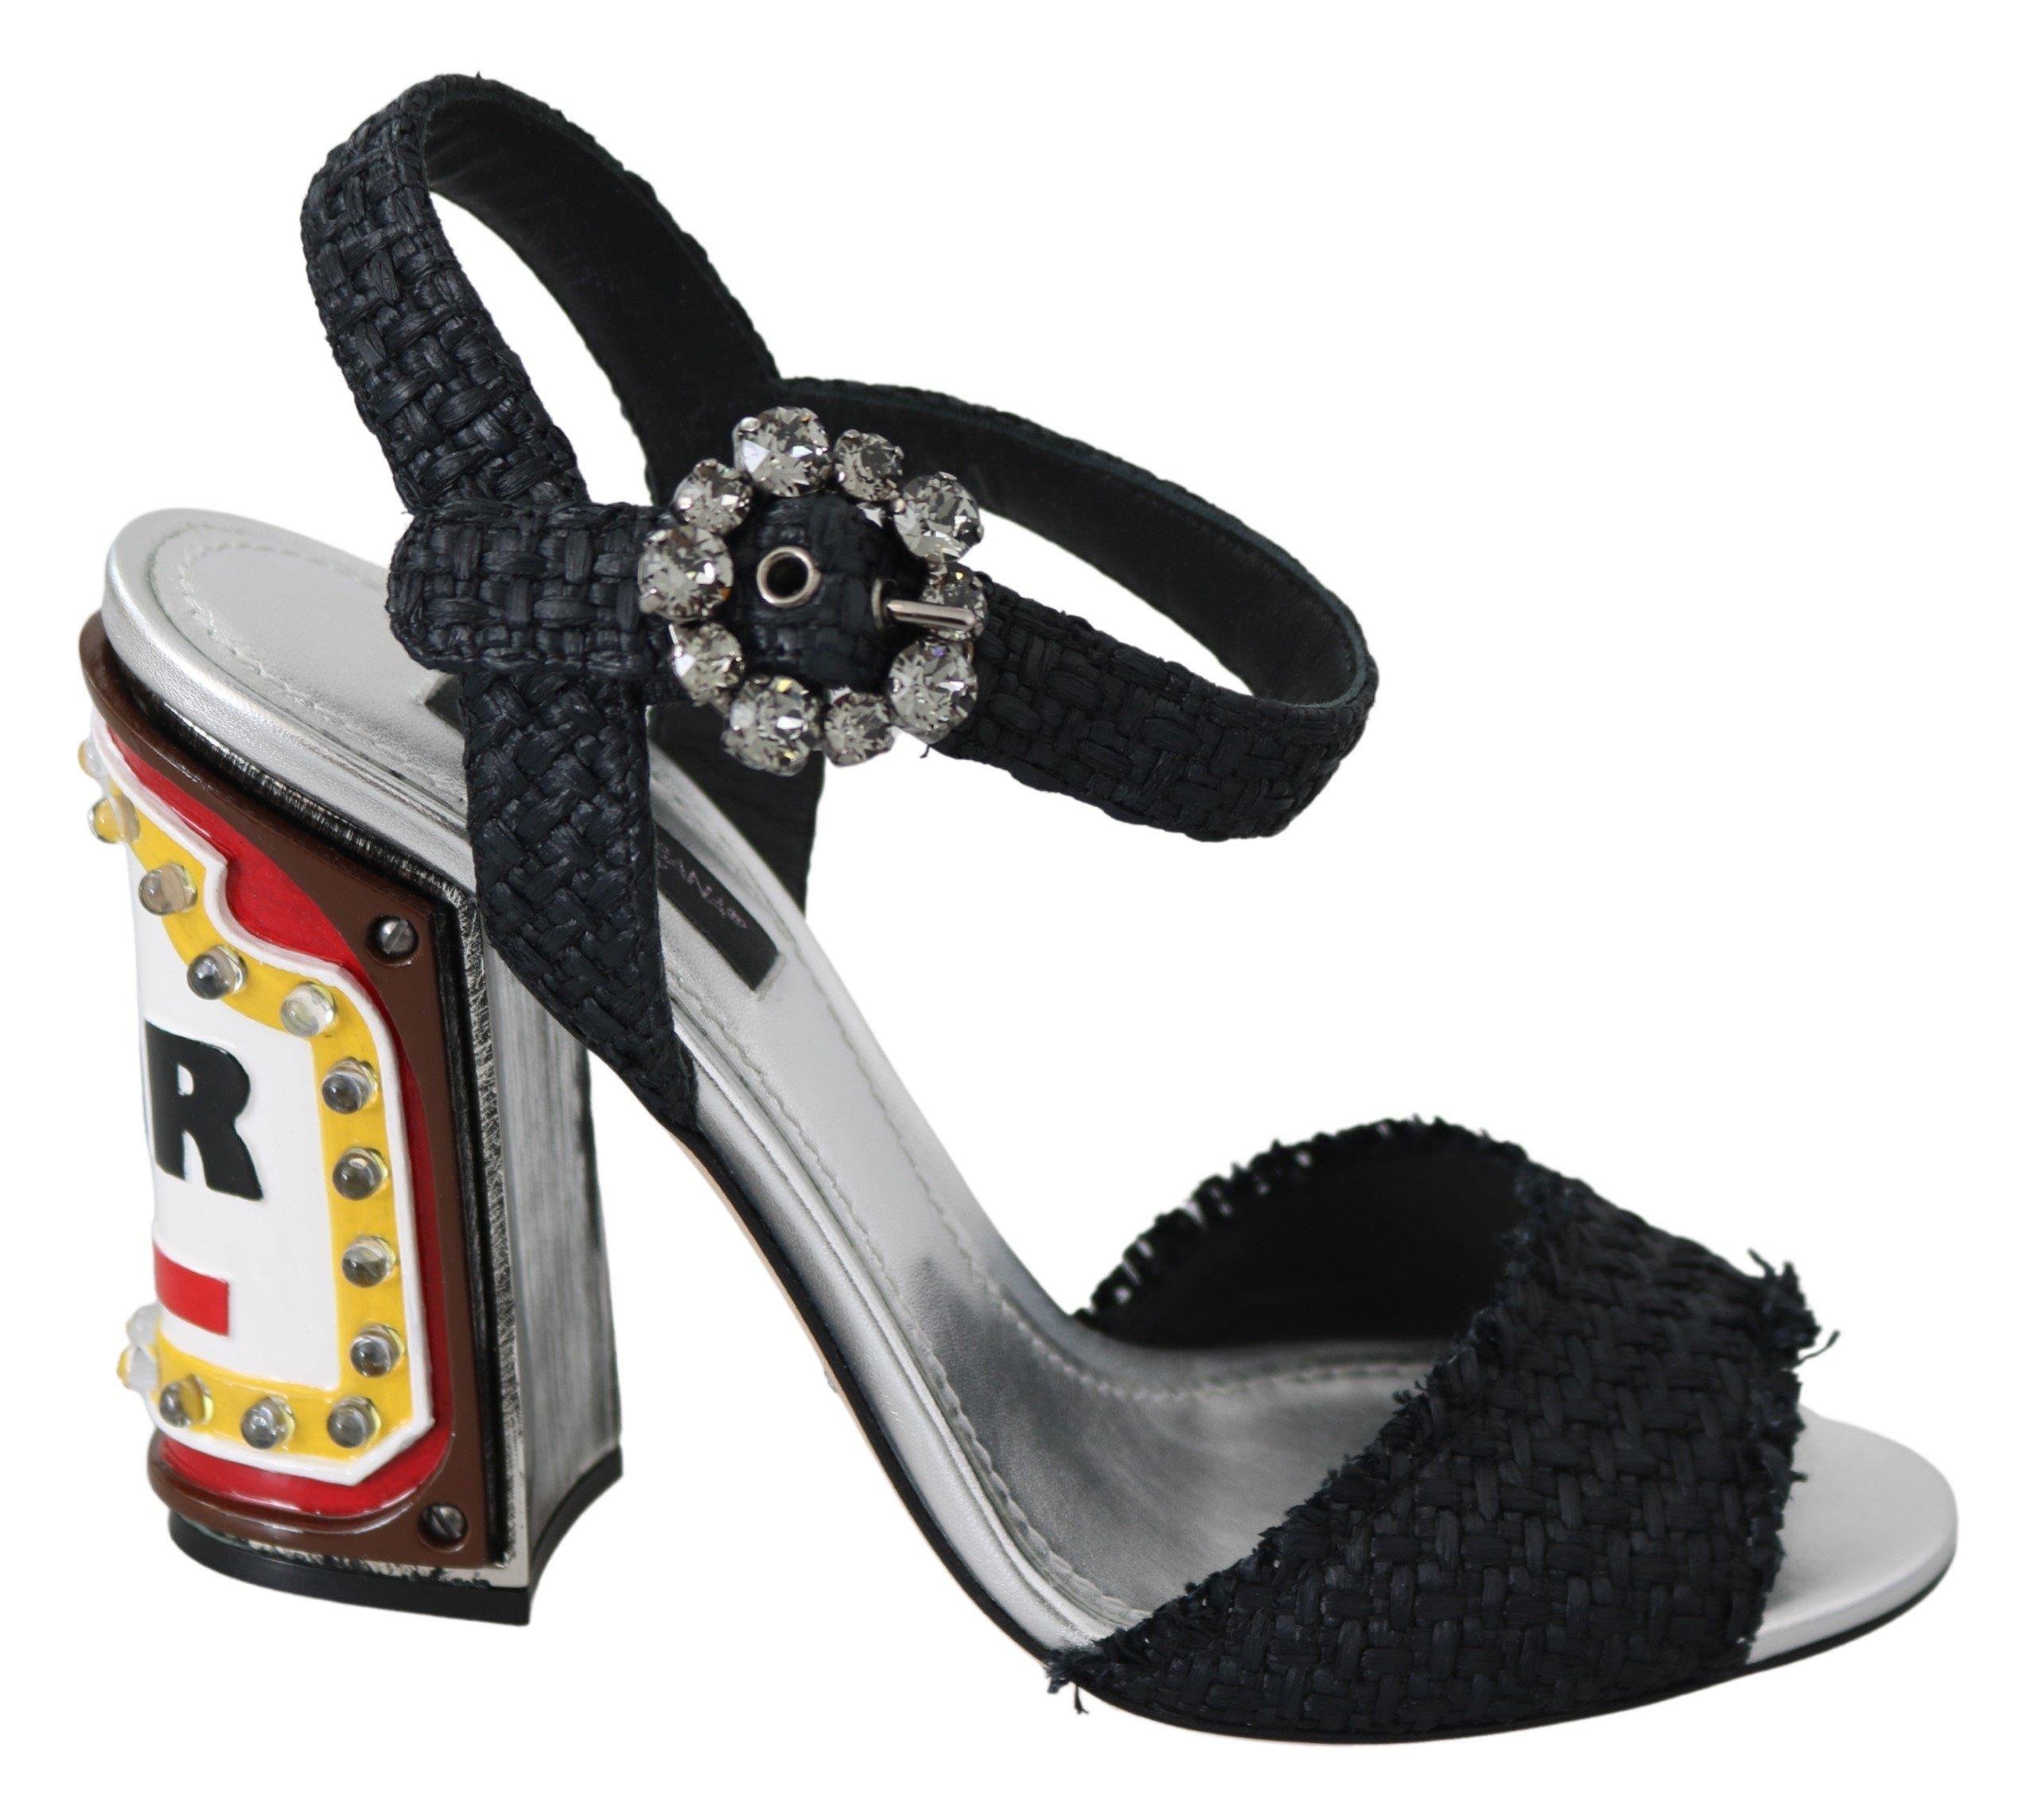 Dolce & Gabbana Women's Crystals LED LIGHTS Sandals Black LA7644-36 - EU36/US5.5